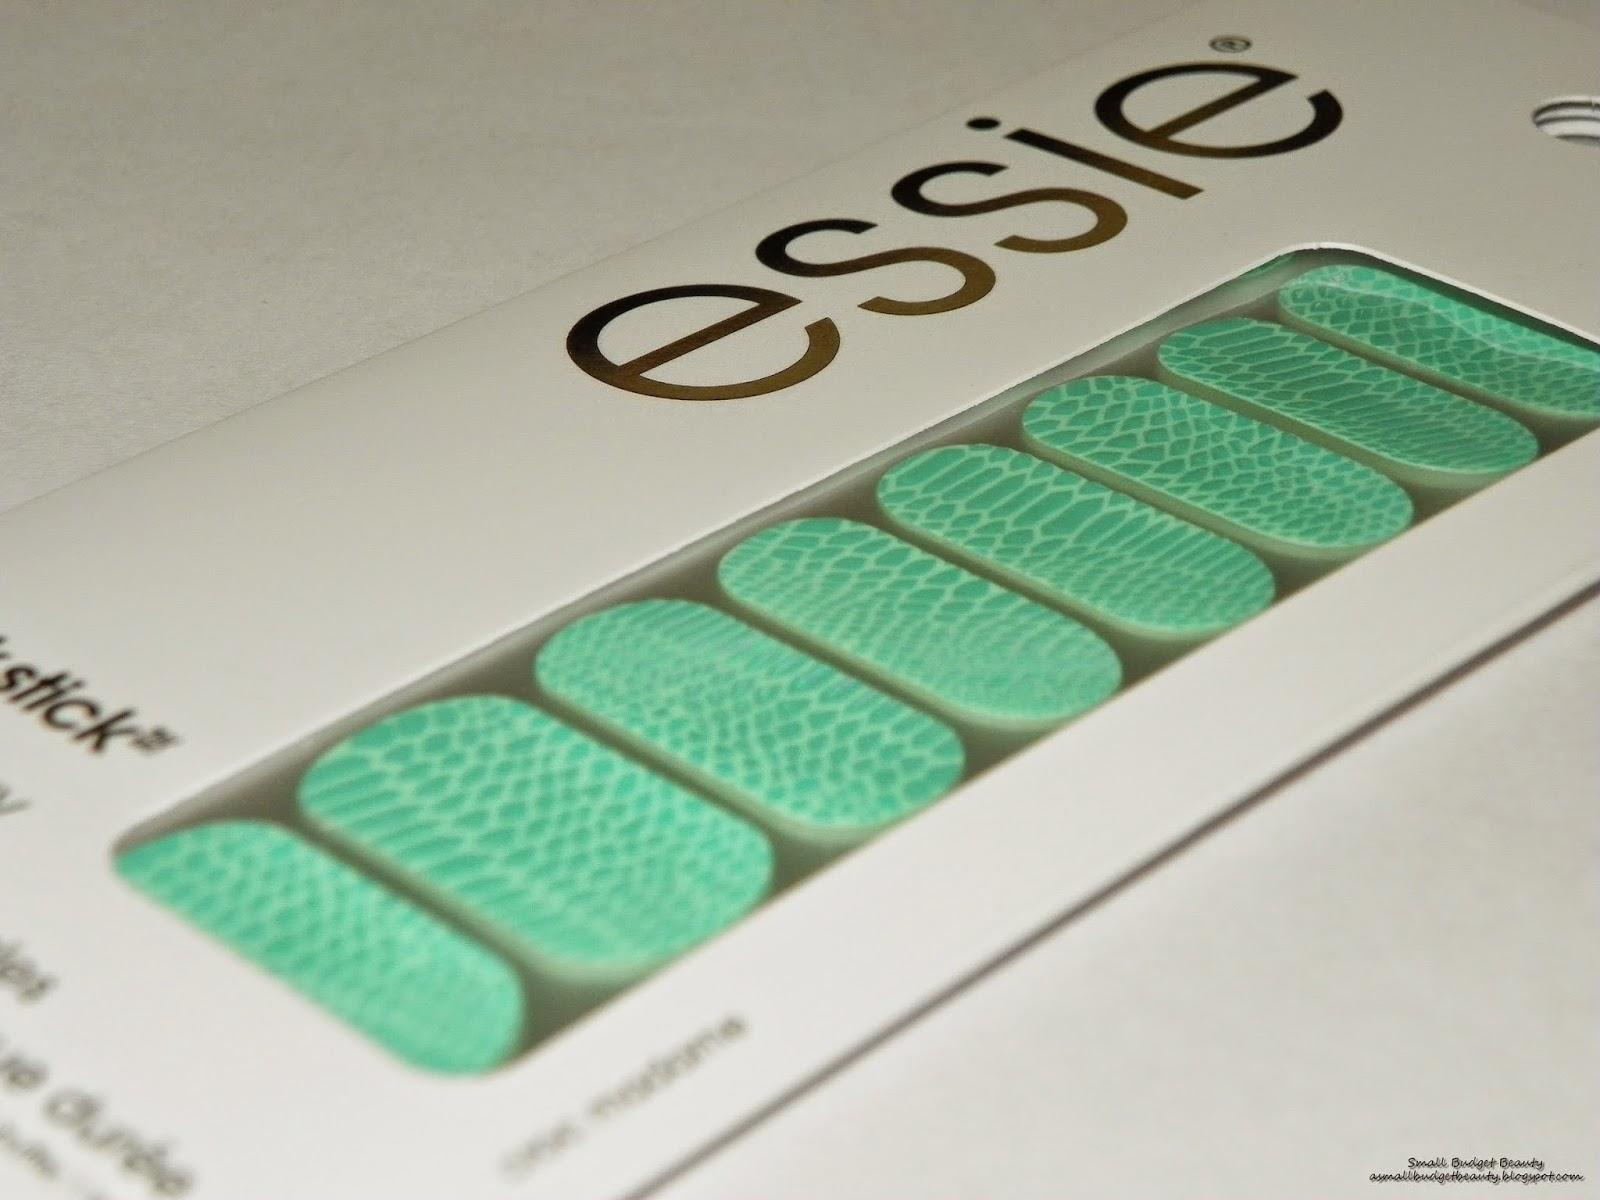 Small Budget Beauty: Review: Essie Sleek Sticks in Croc Madame